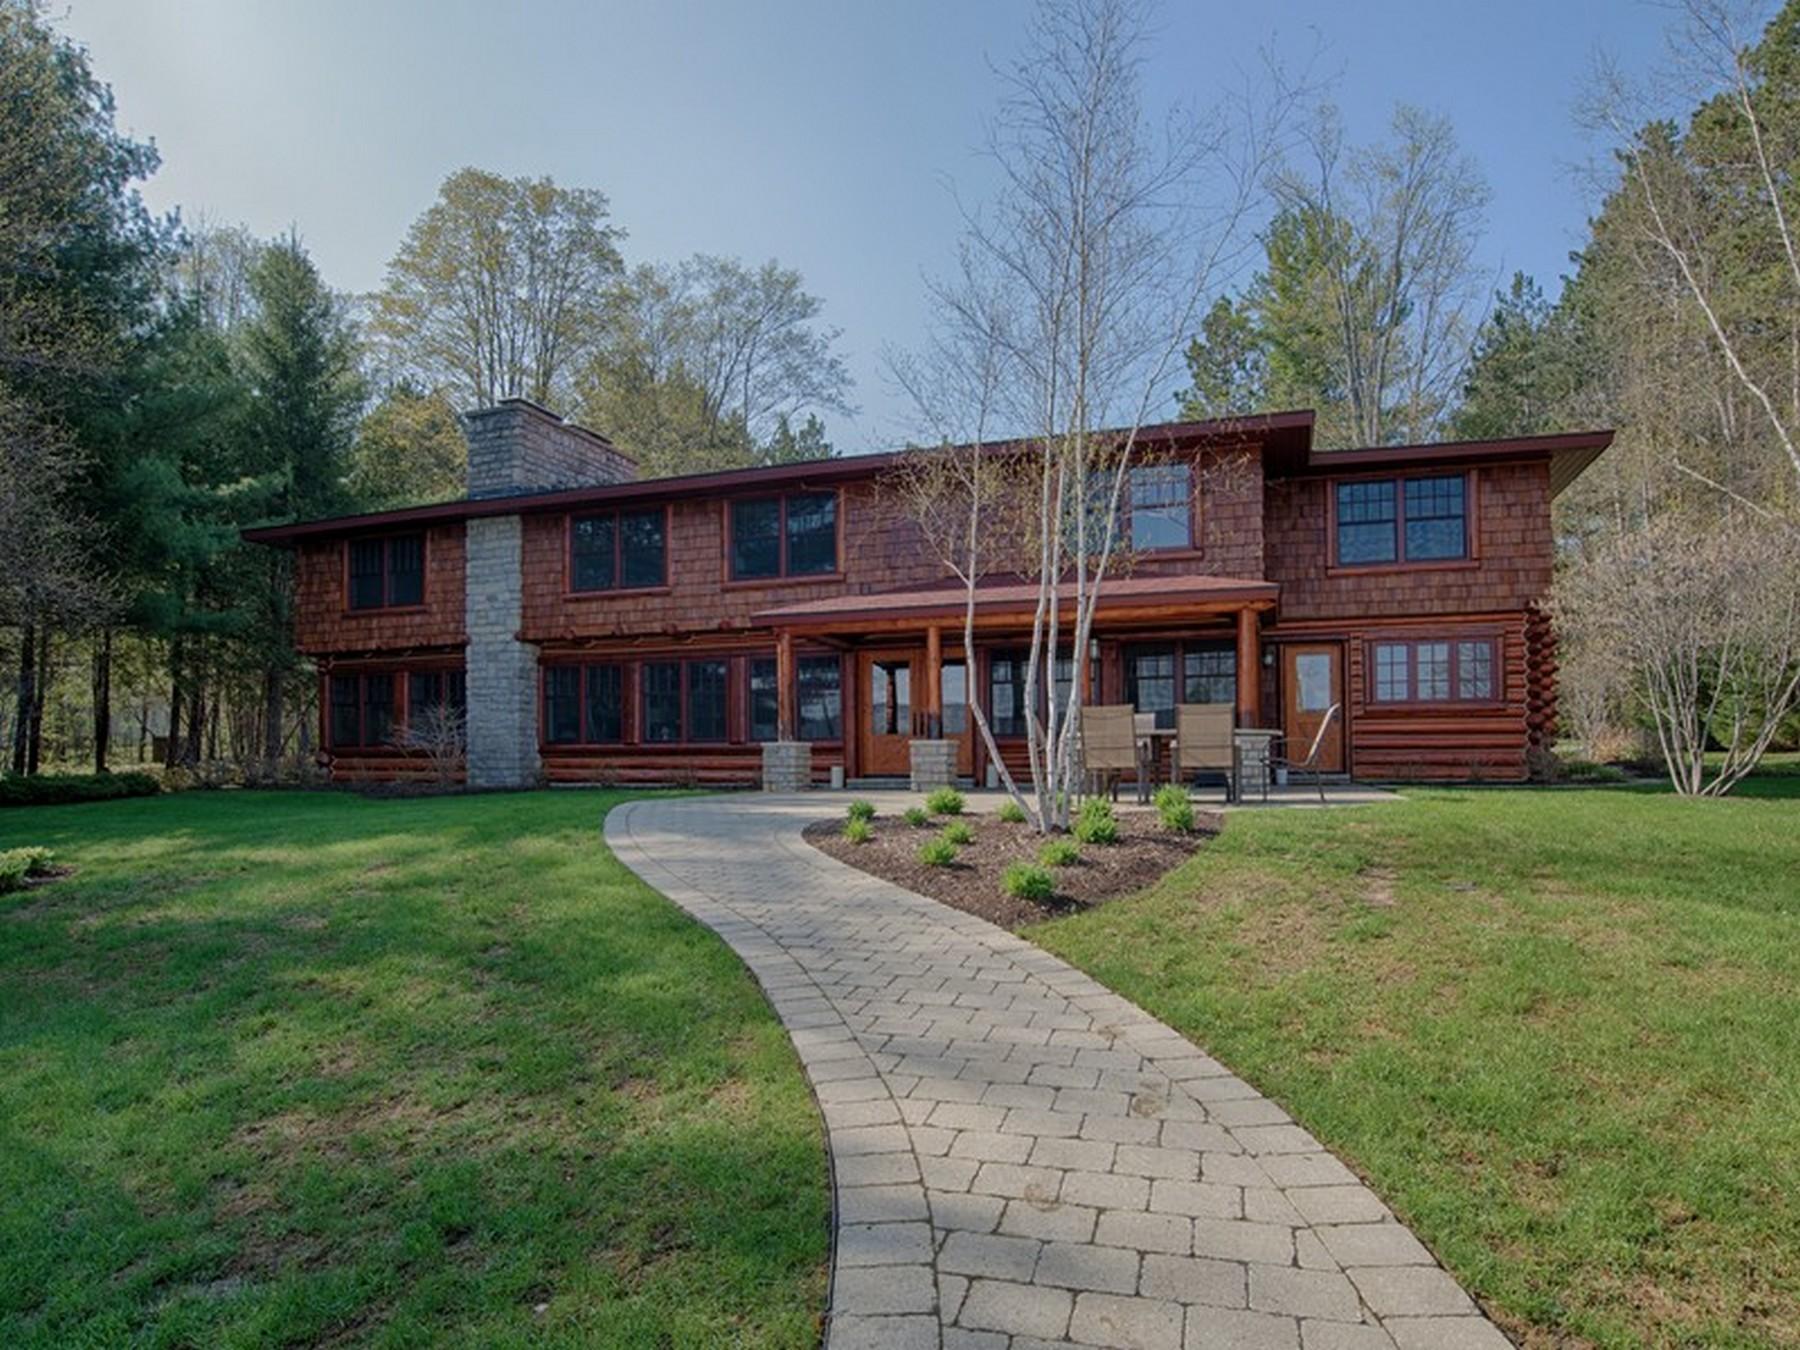 Single Family Home for Sale at Bear Lake Lodge 03595 M-75 North Boyne City, Michigan, 49796 United States